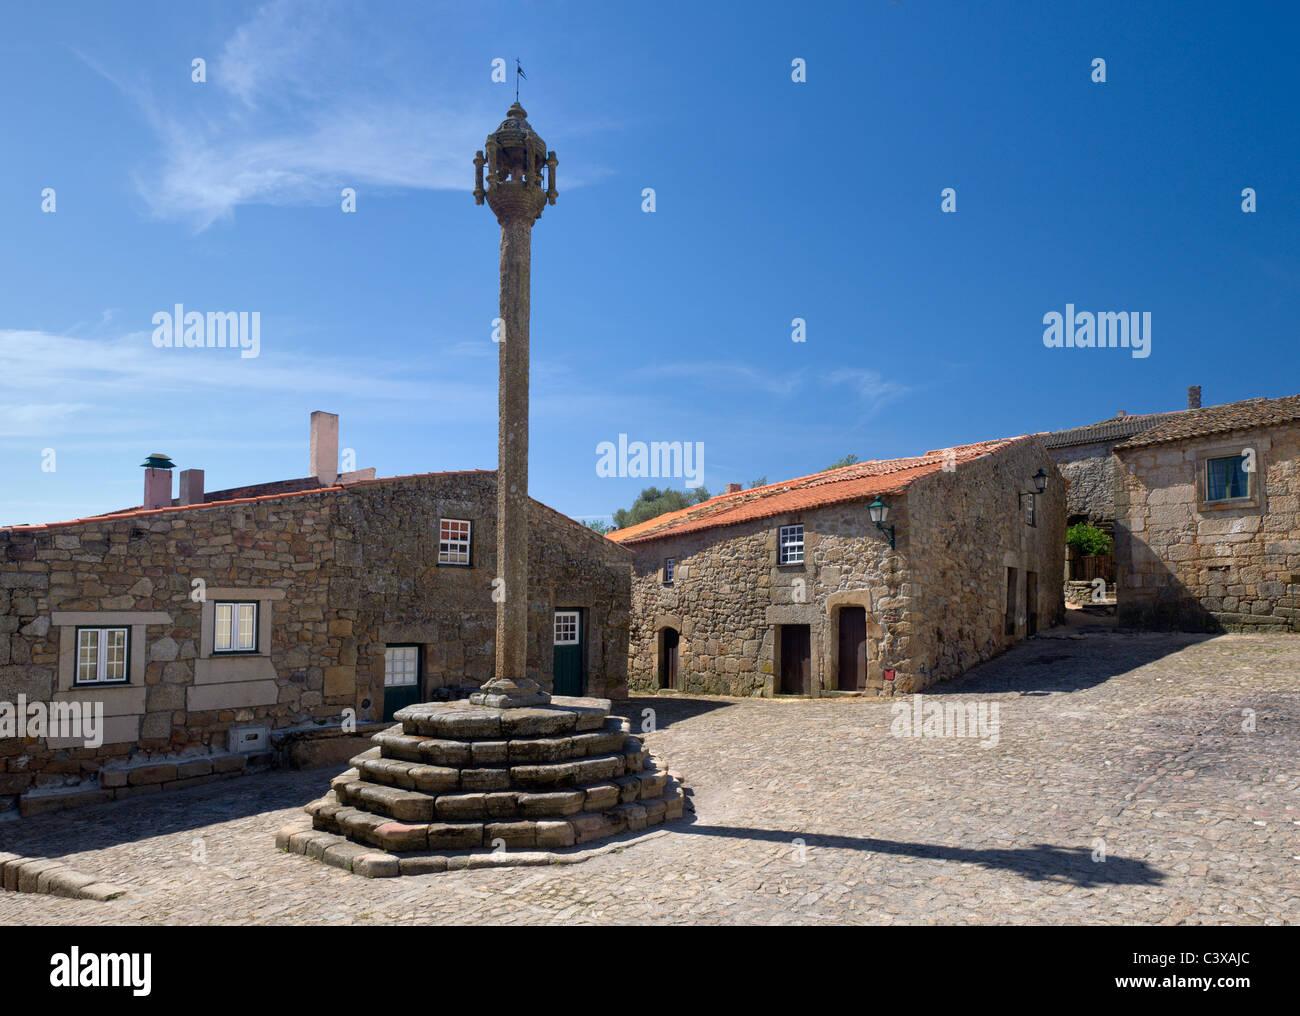 Portugal, Beira Alta, historic village of Castelo Mendo Stock Photo, Royalty Free Image